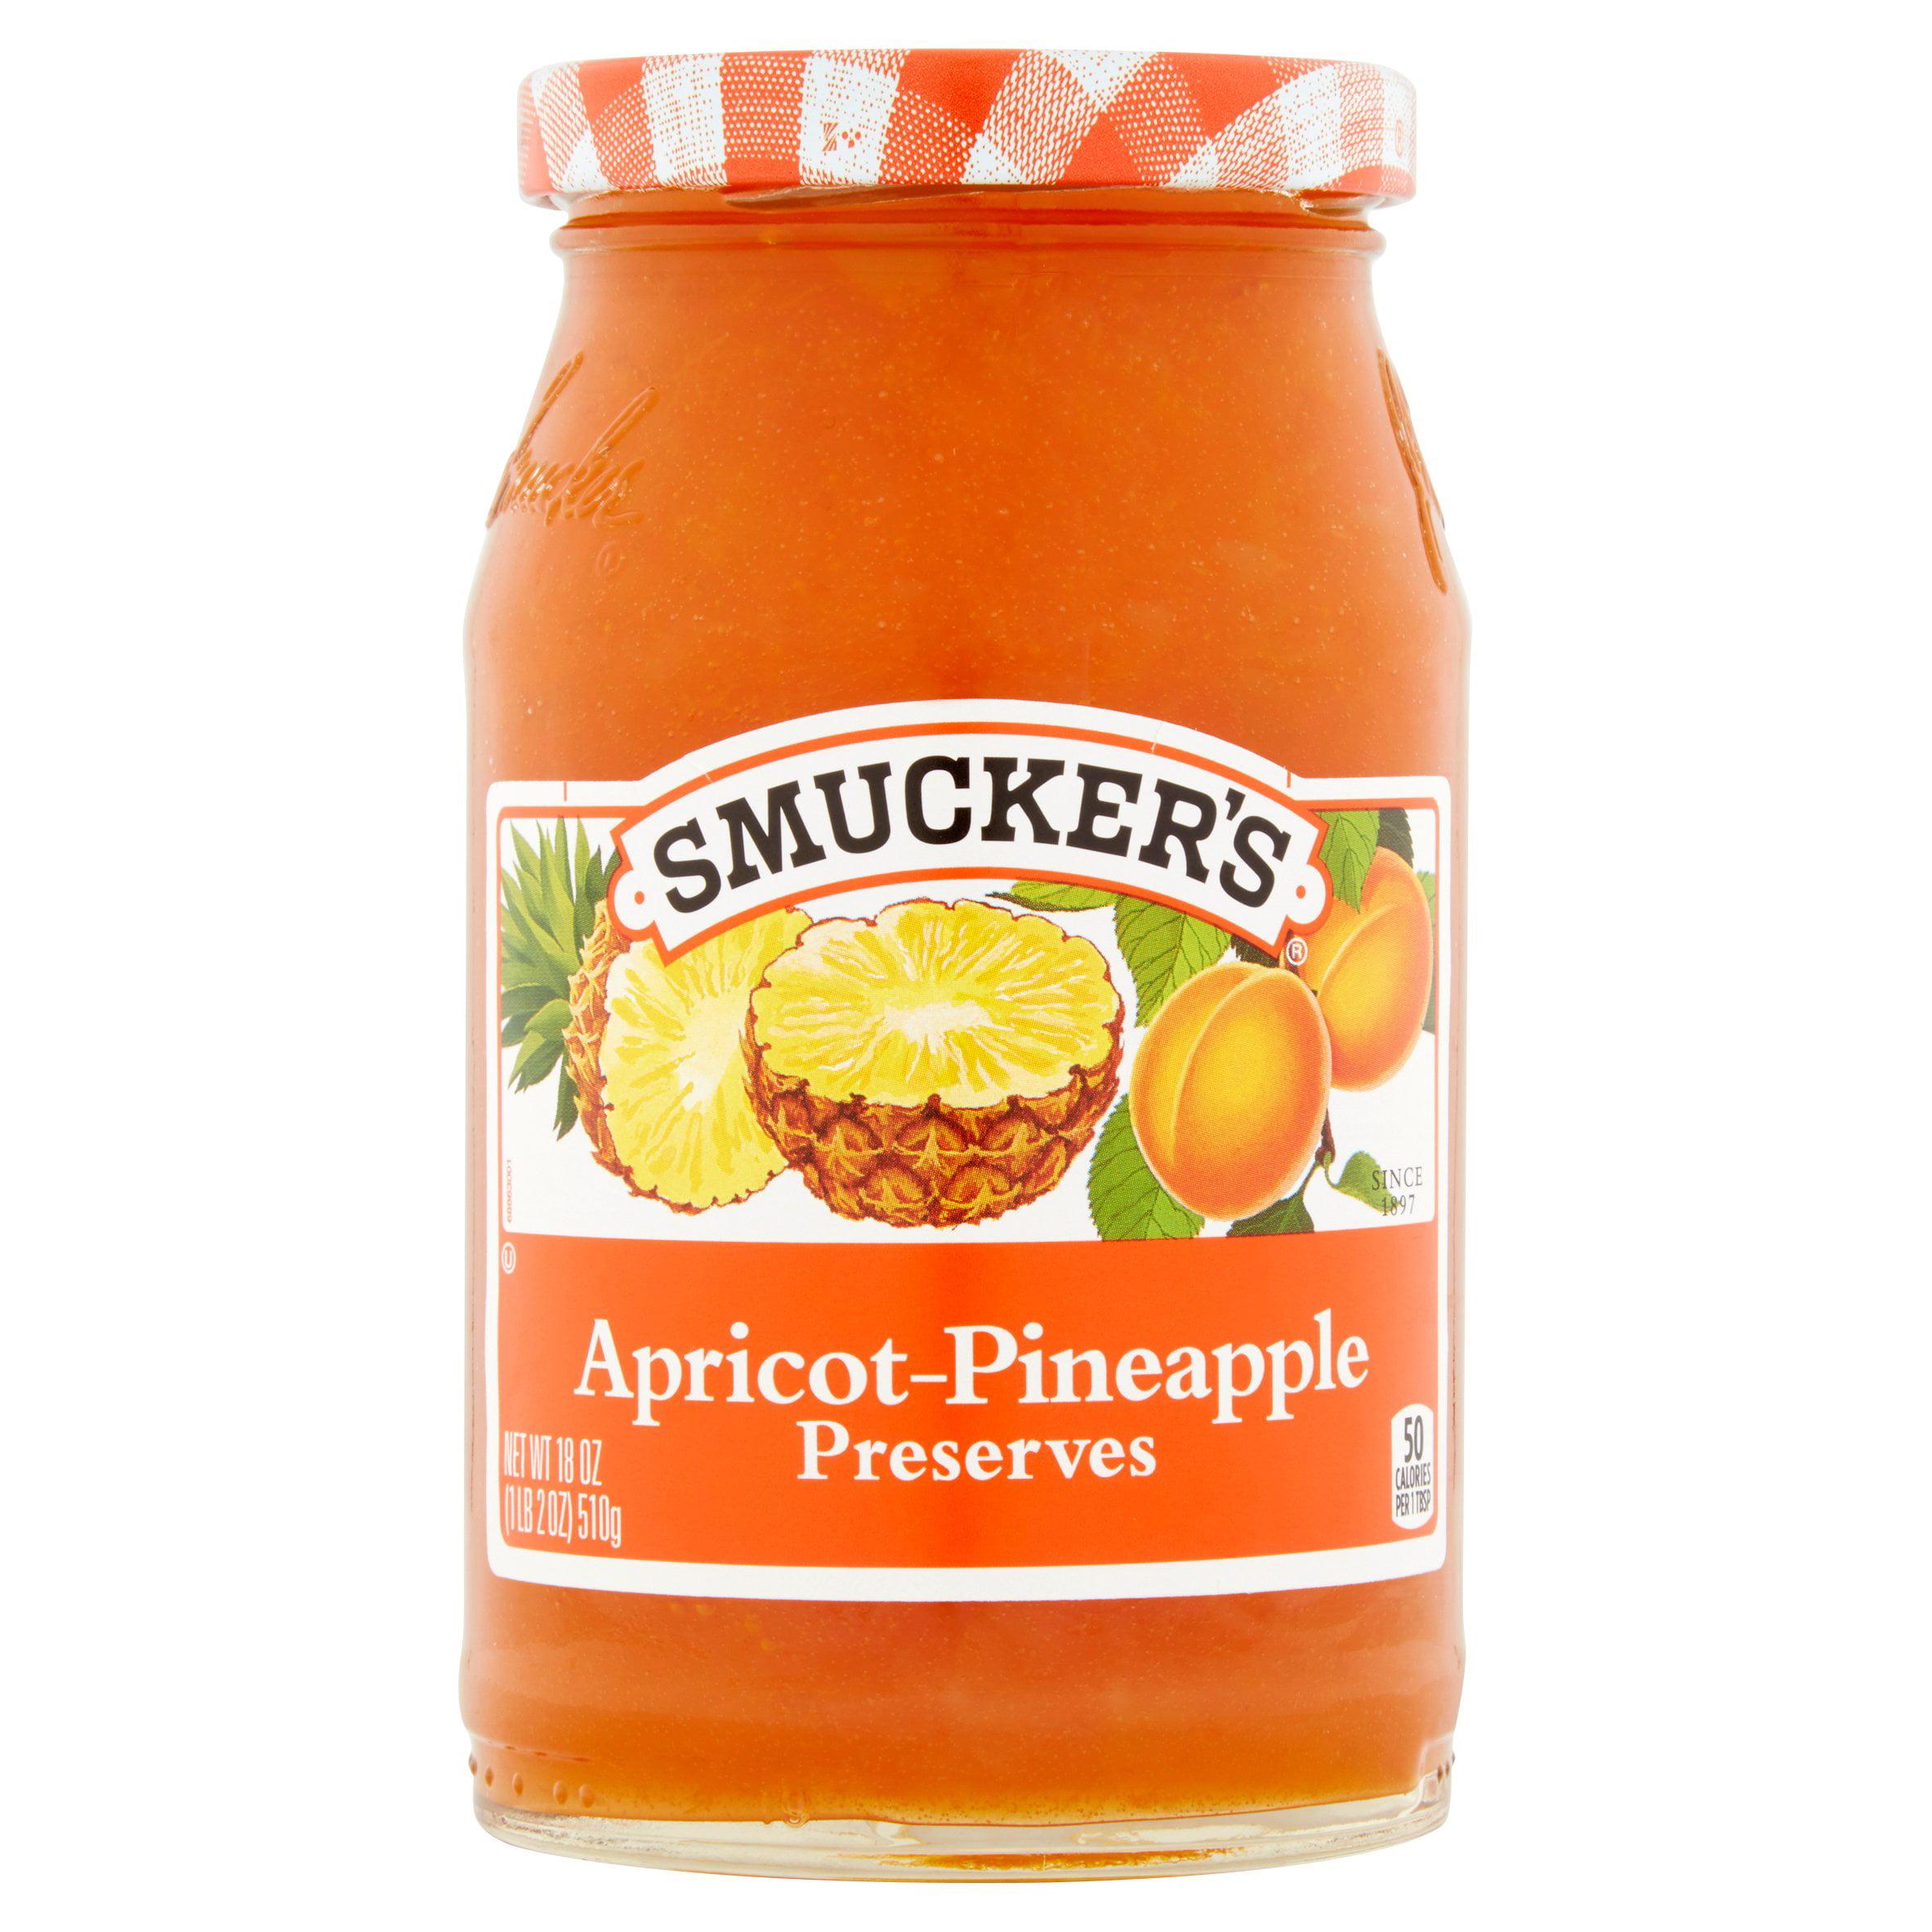 Smucker's Apricot-Pineapple Preserves, 18 oz